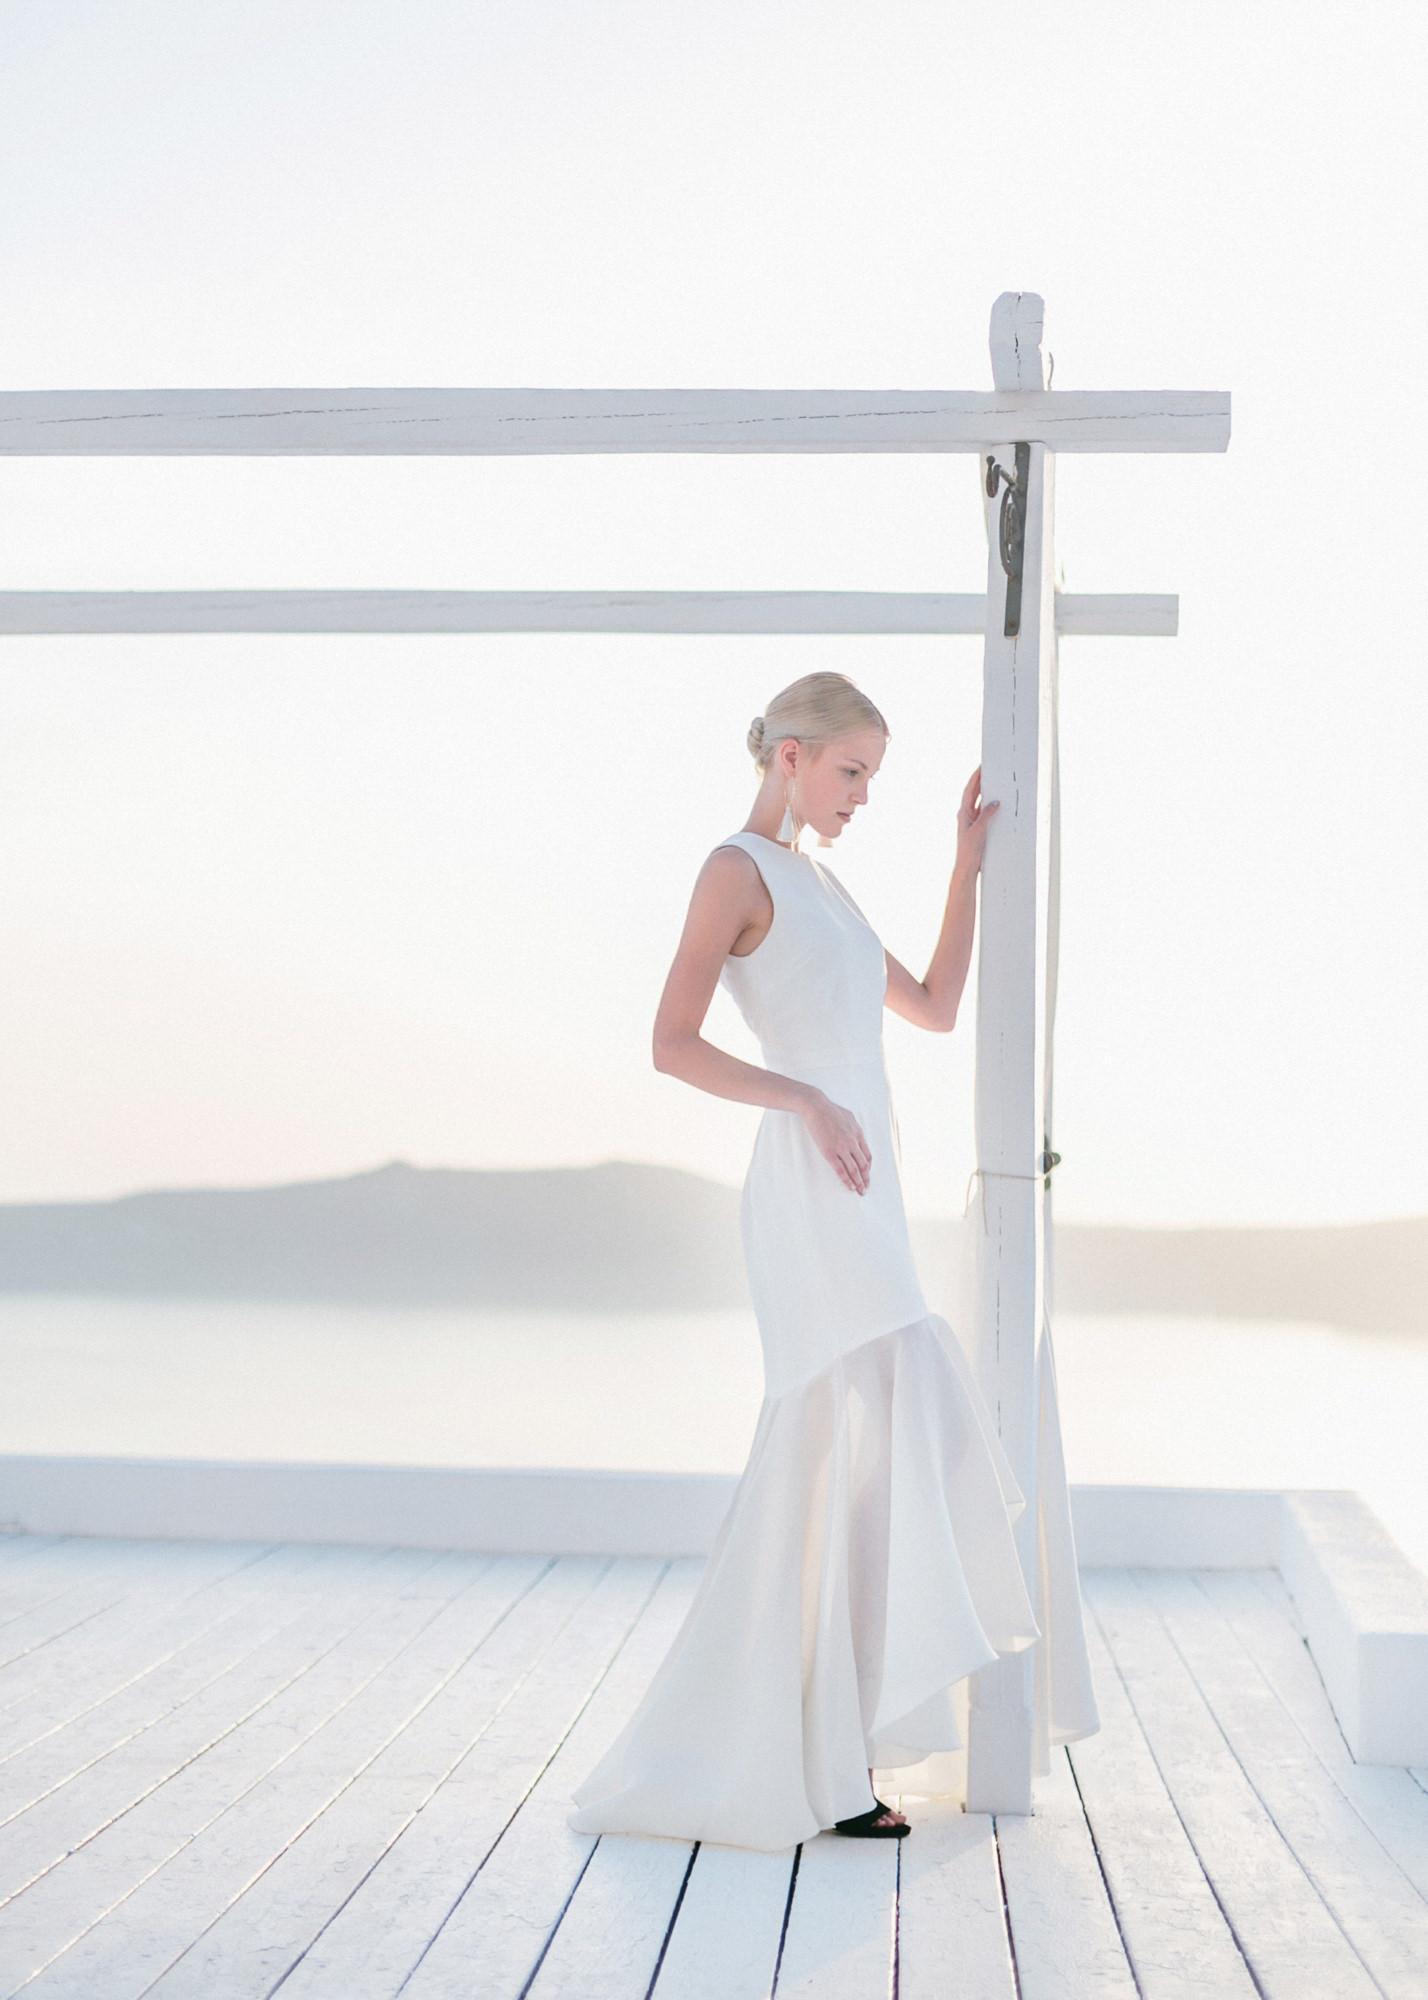 57-portrait-santorini-wedding-photographer-greece-b-v